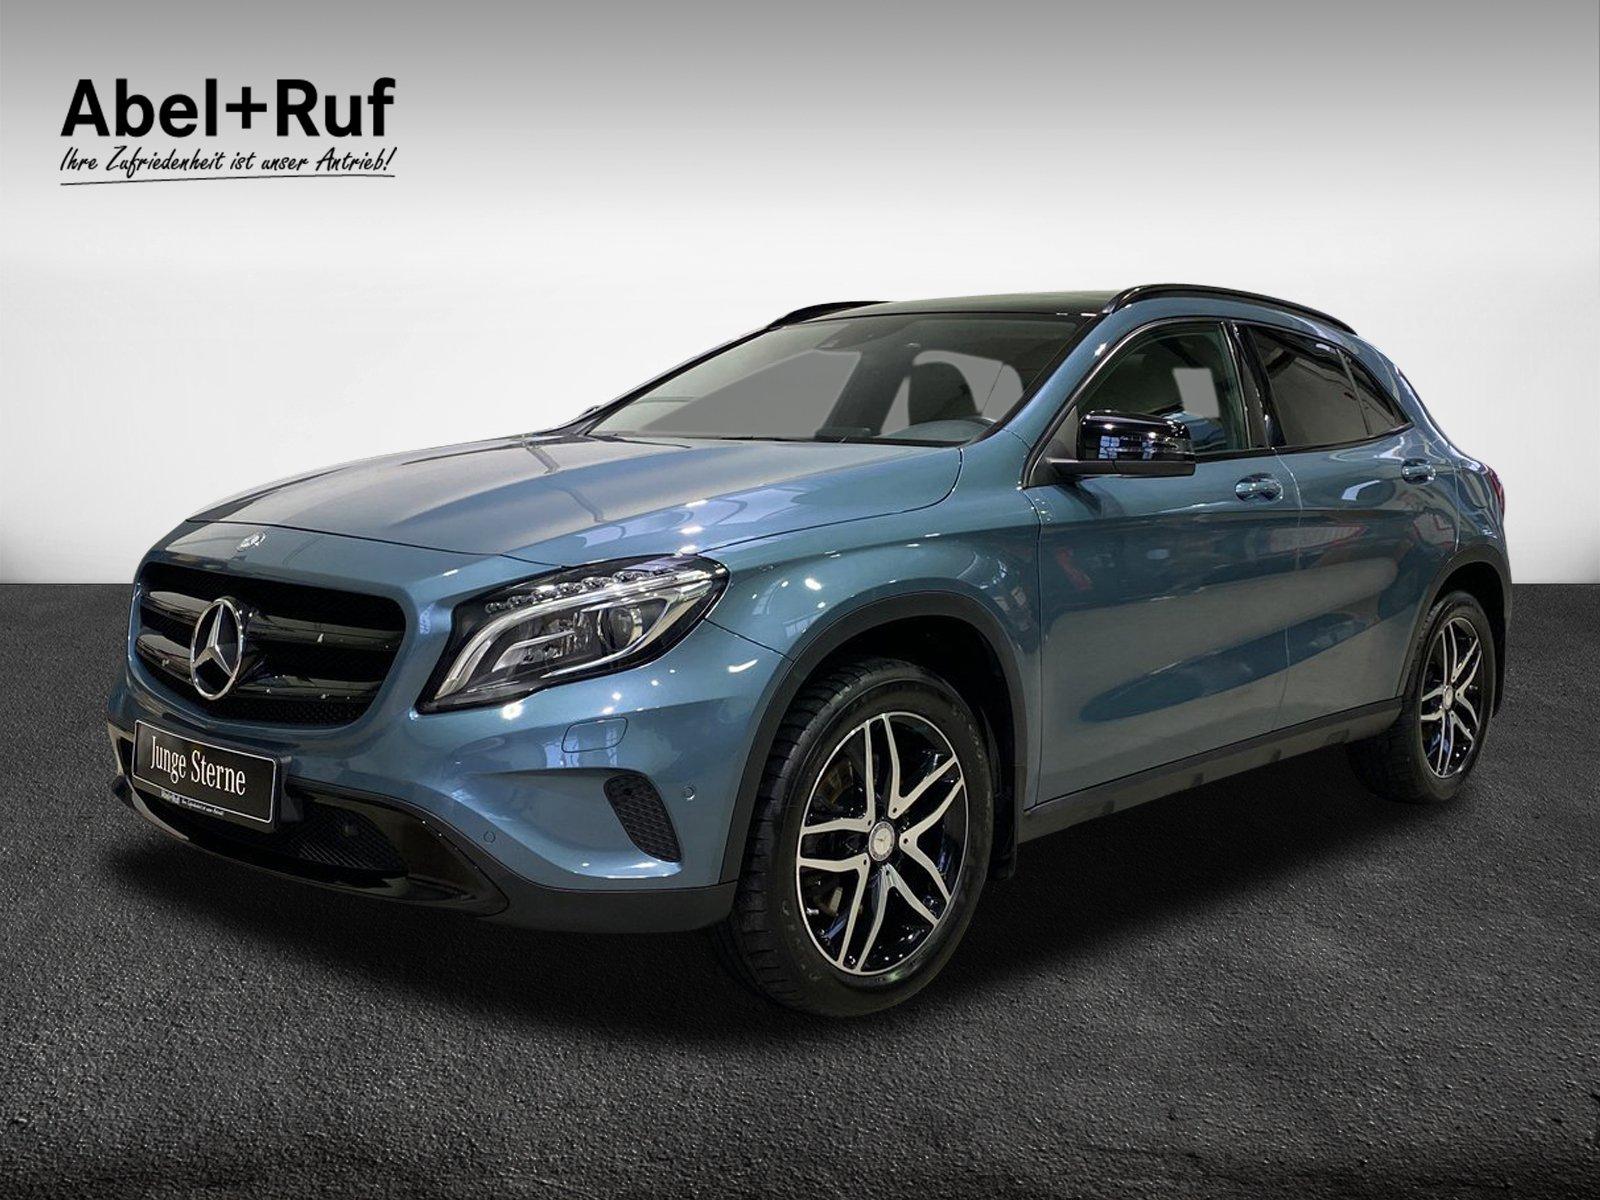 Mercedes-Benz GLA 250 Urban 4M+Kamera+AHK+Pano+Navi+ILS+SpurPK, Jahr 2015, Benzin